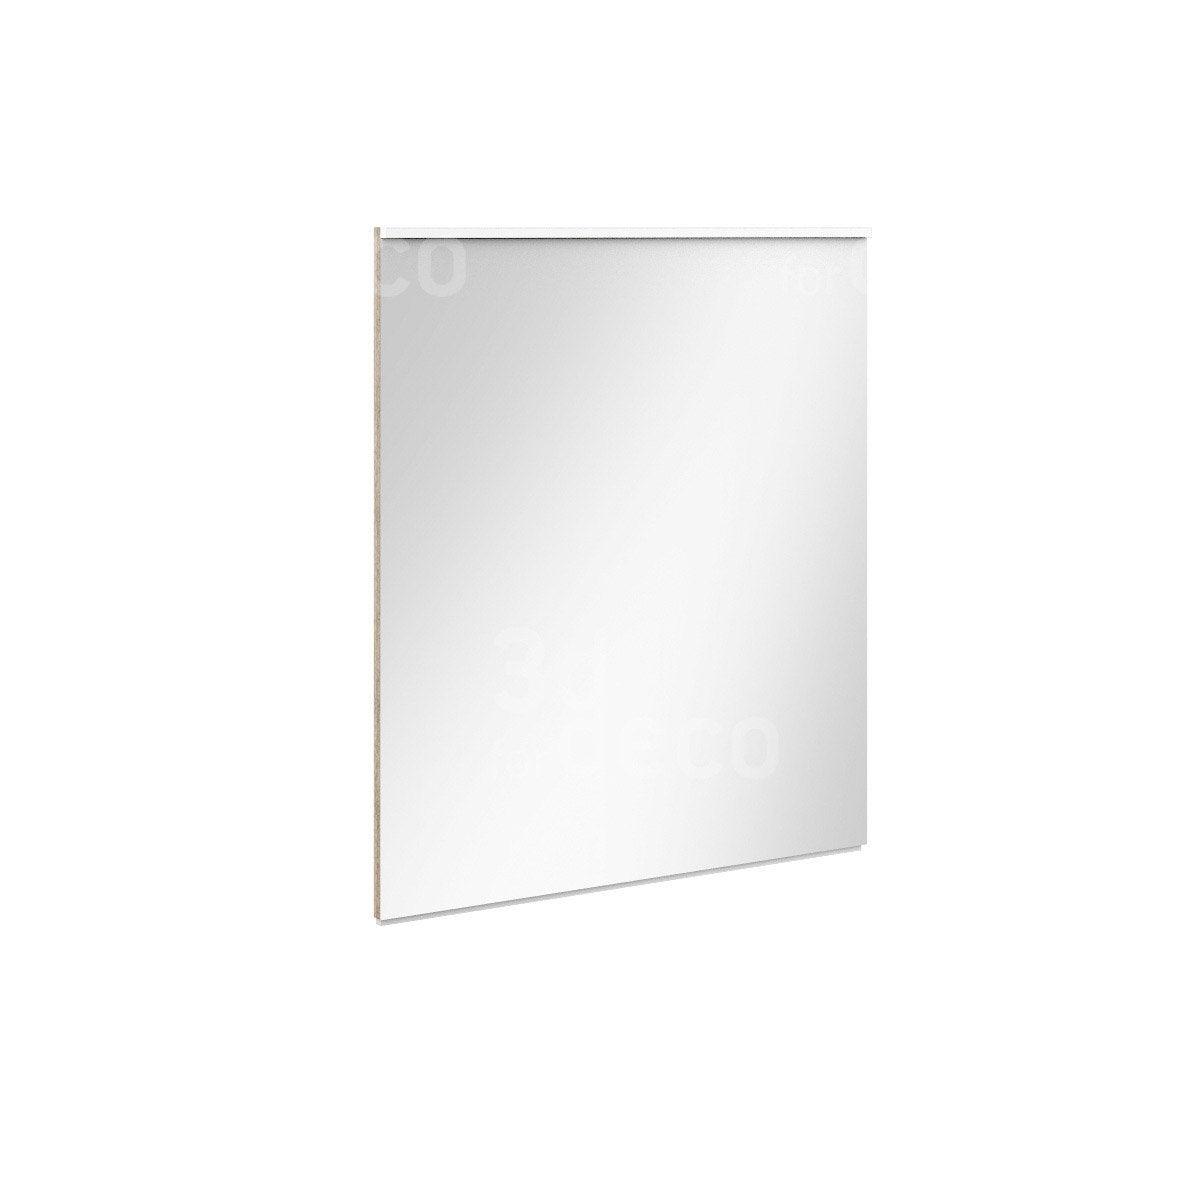 miroir avec clairage int gr l 90 cm eden leroy merlin. Black Bedroom Furniture Sets. Home Design Ideas